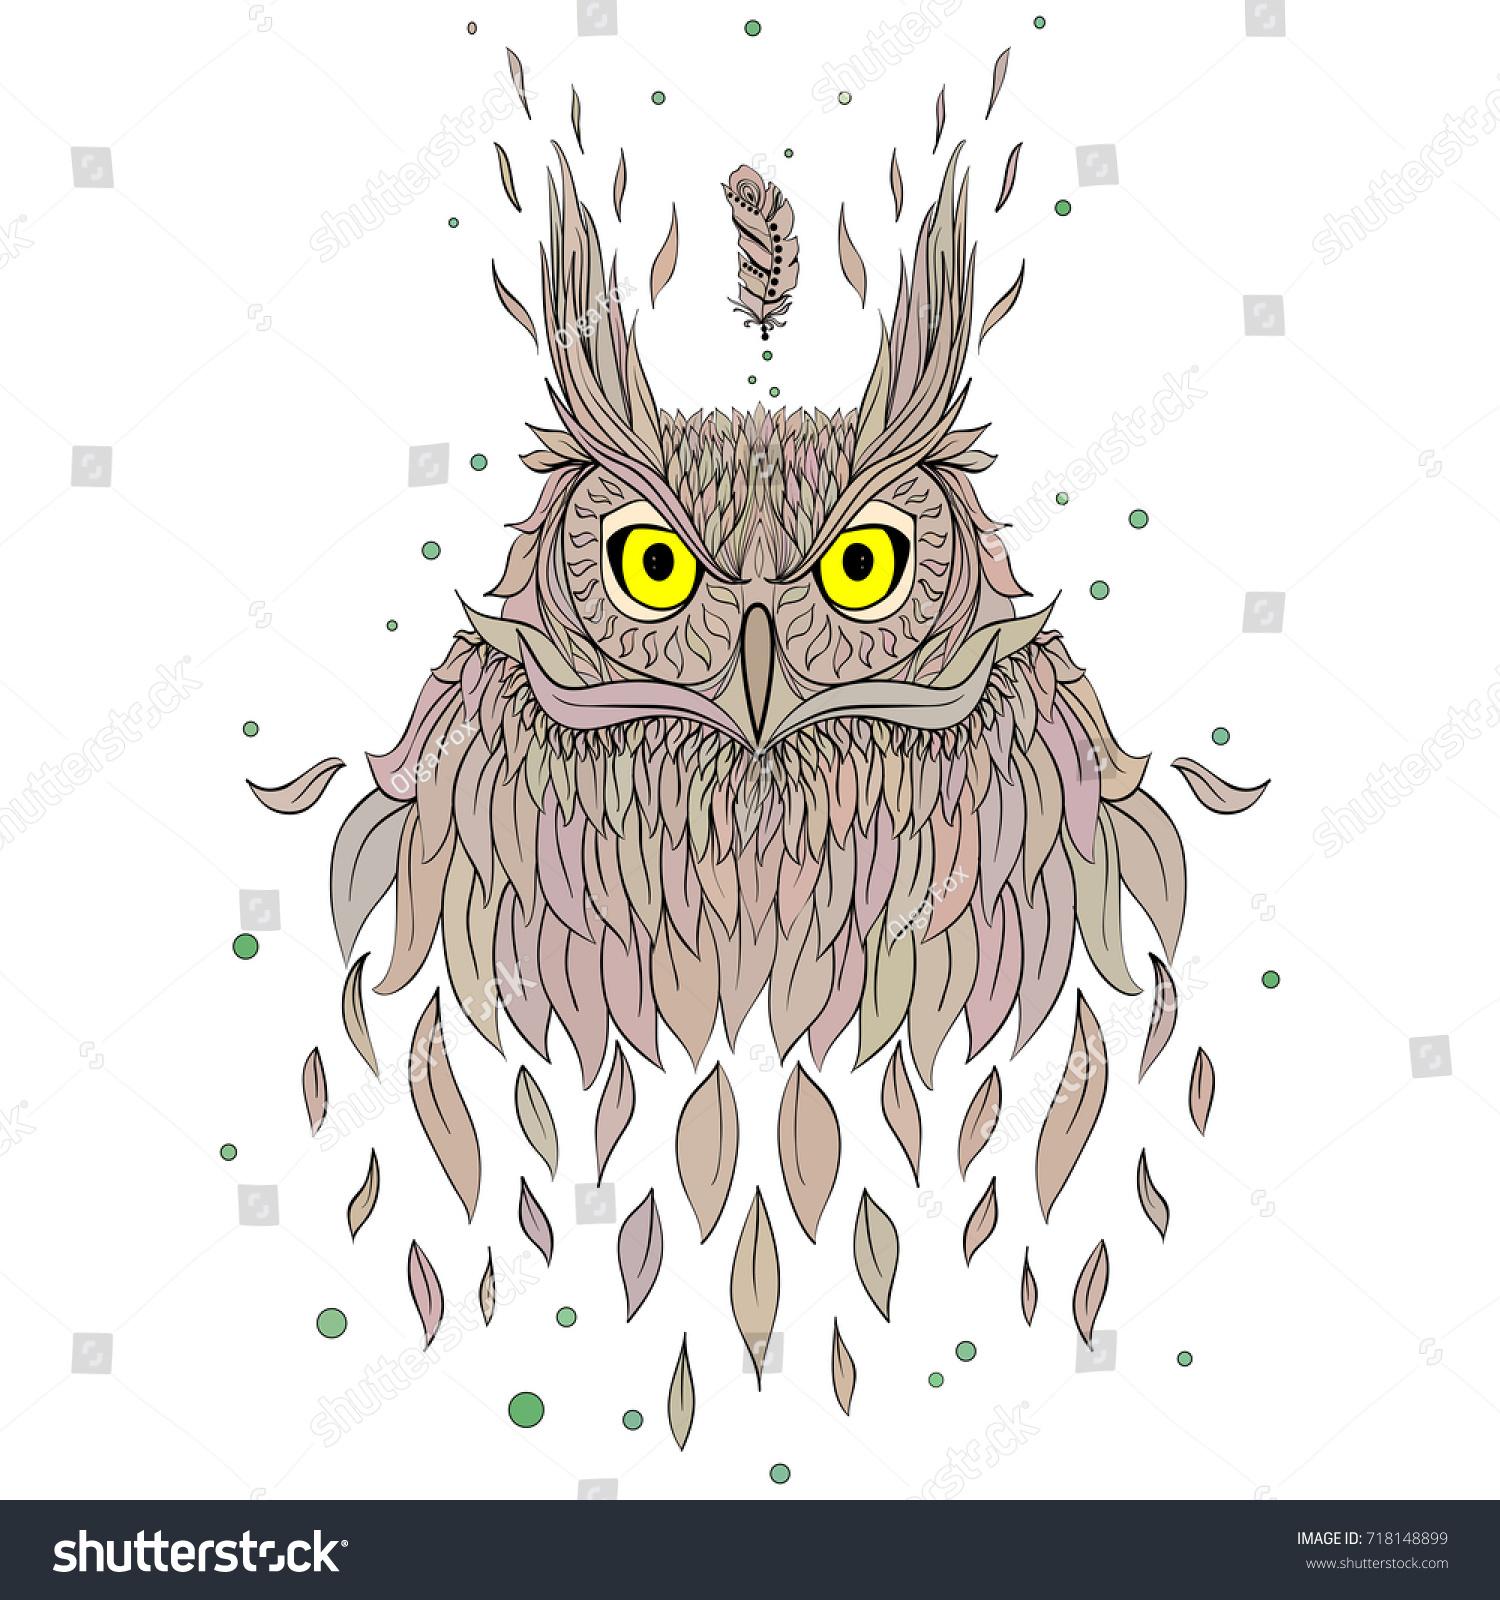 hand drawn fashion portrait geek owl stock vector 718148899